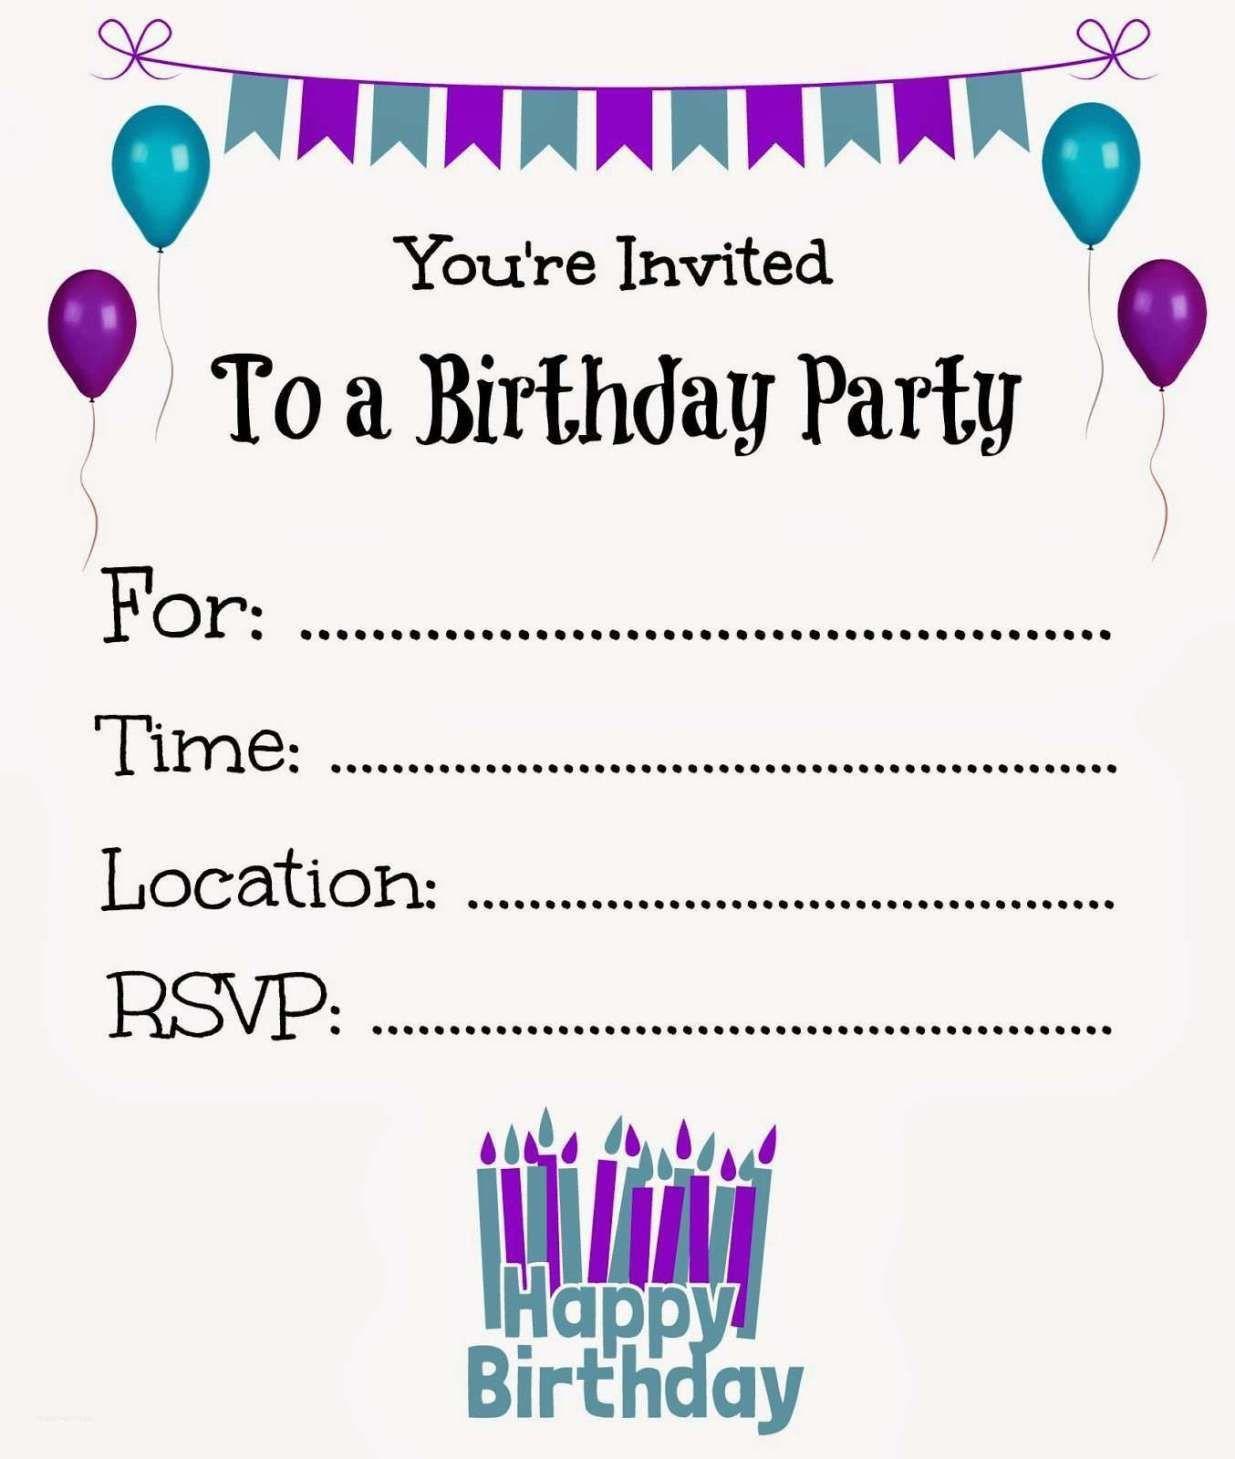 005 Amazing Free Online Printable Birthday Invitation Template Inspiration  Templates Card MakerFull